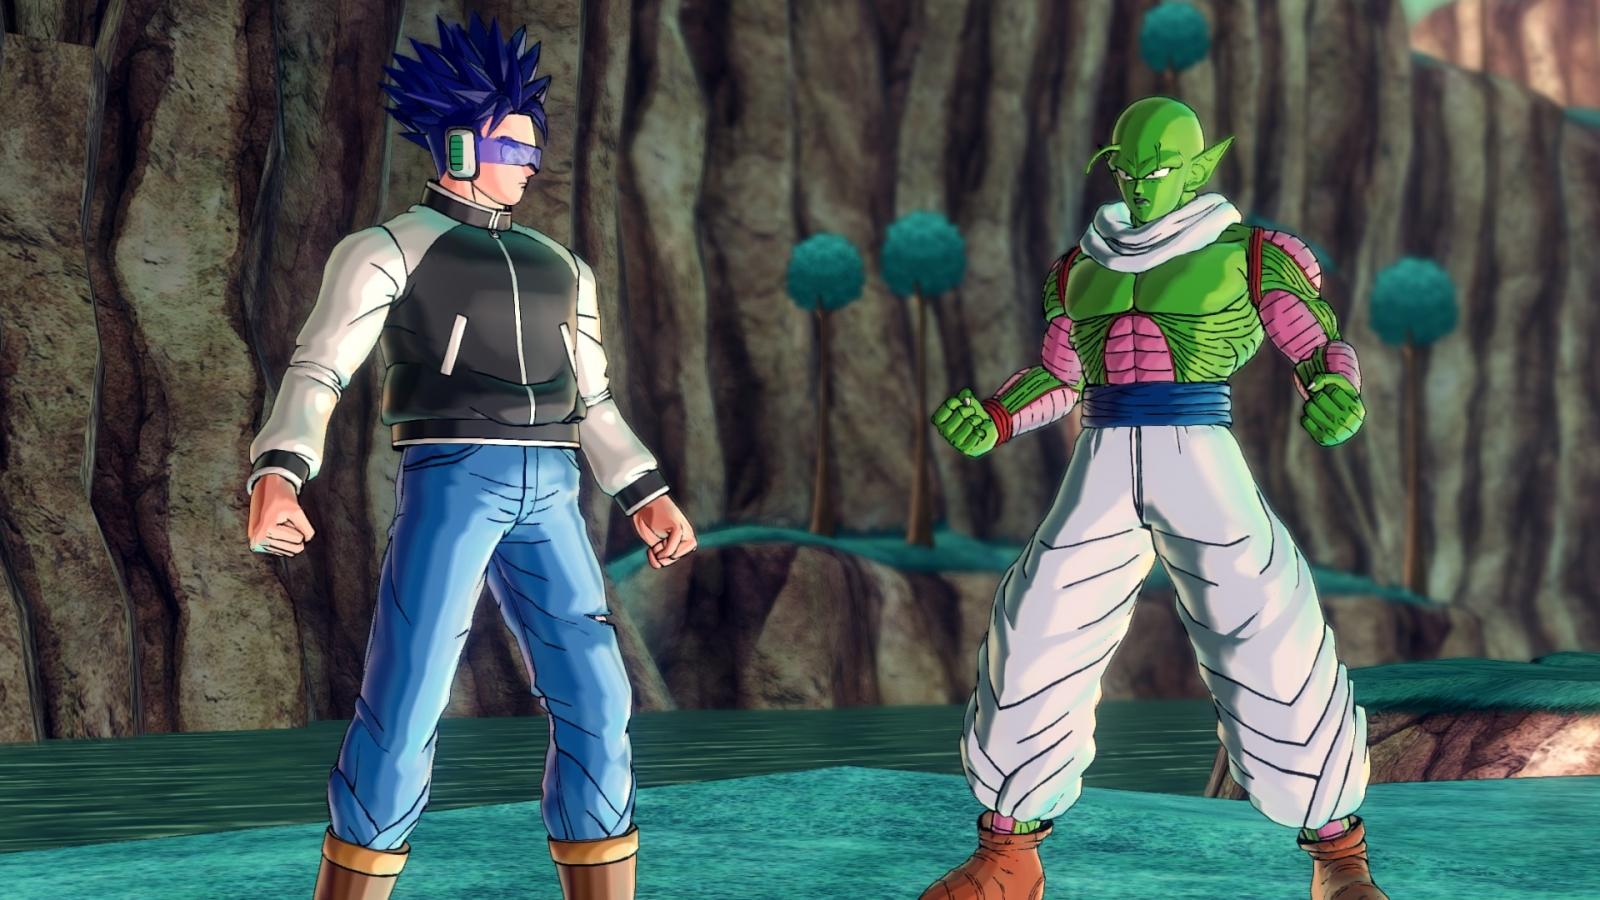 Dragon Ball Xenoverse 2 hands-on: Worthy of the Super Saiyan